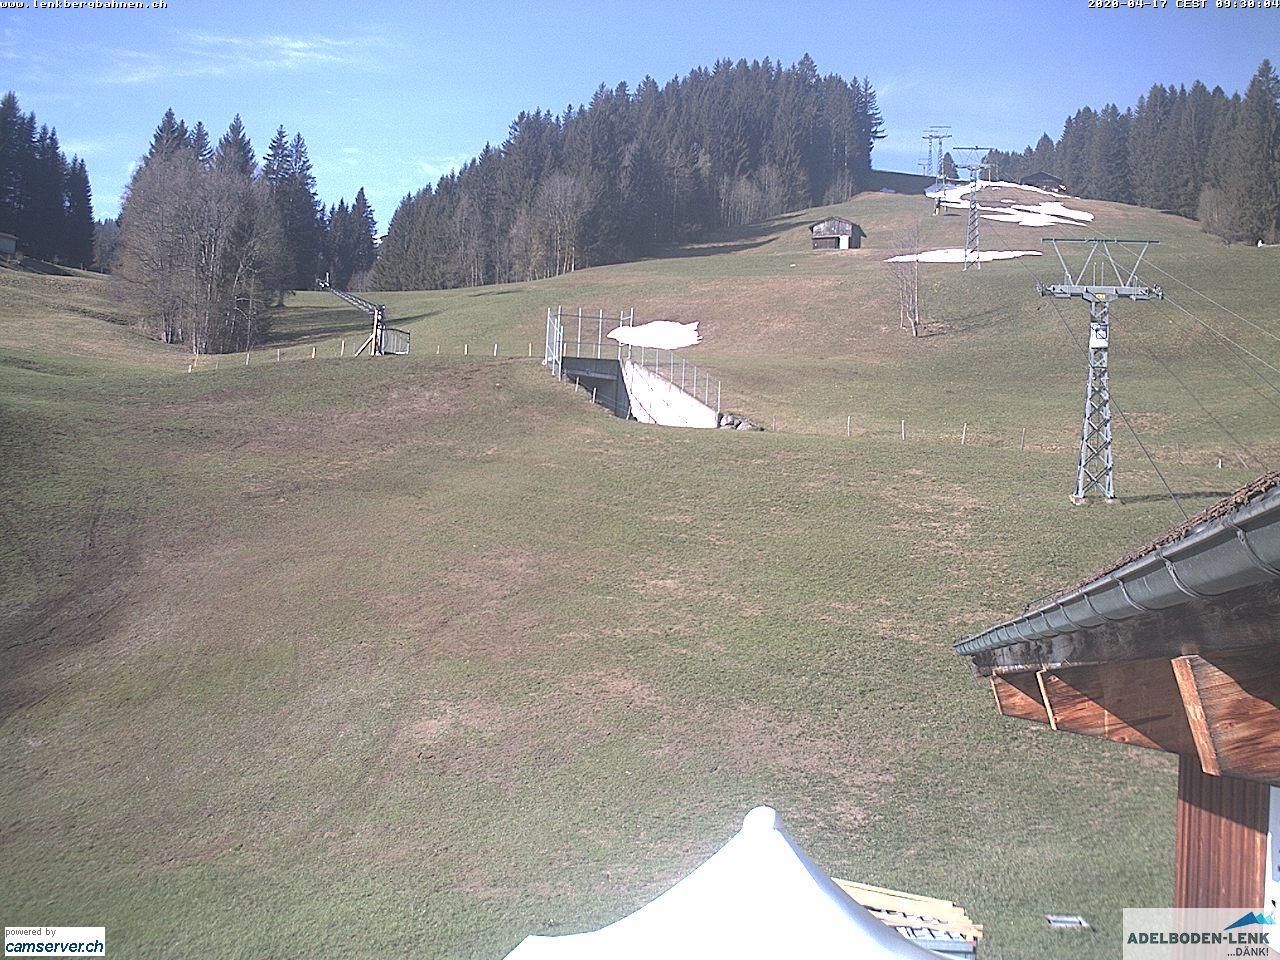 Webcam en Wallegg, Adelboden - Lenk (Suiza)